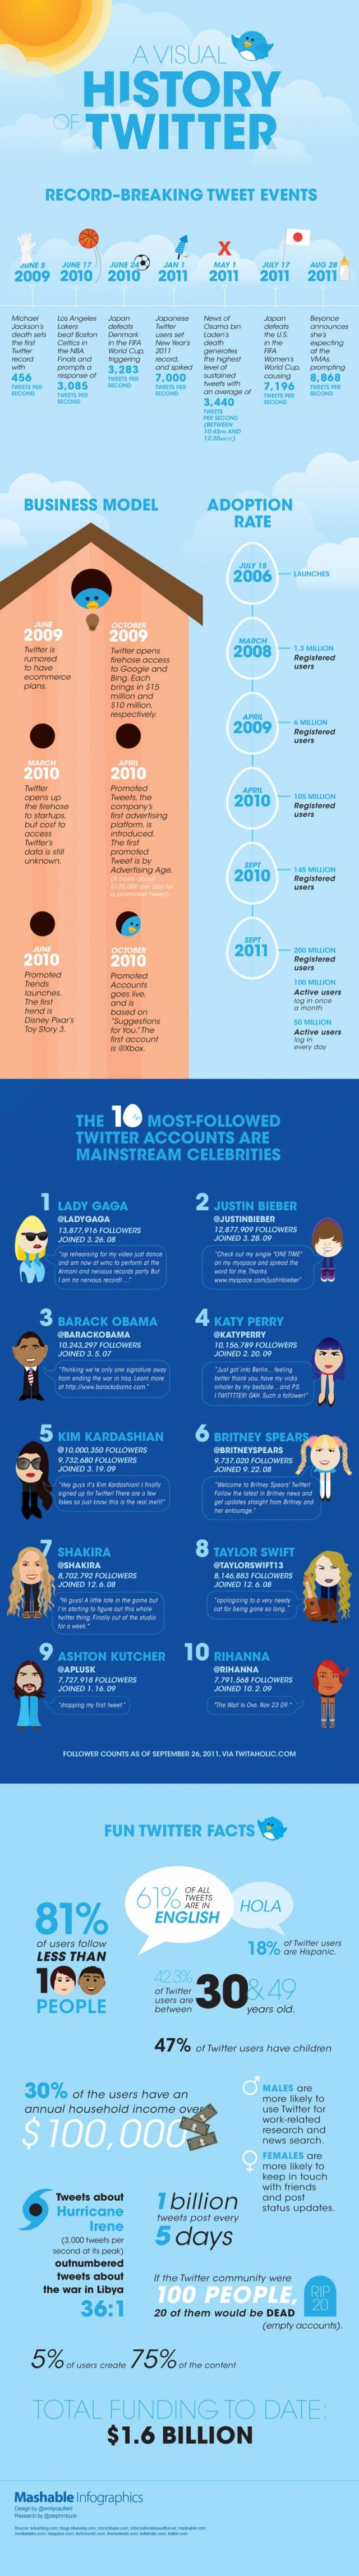 mashable_infographic-graphics-twitter